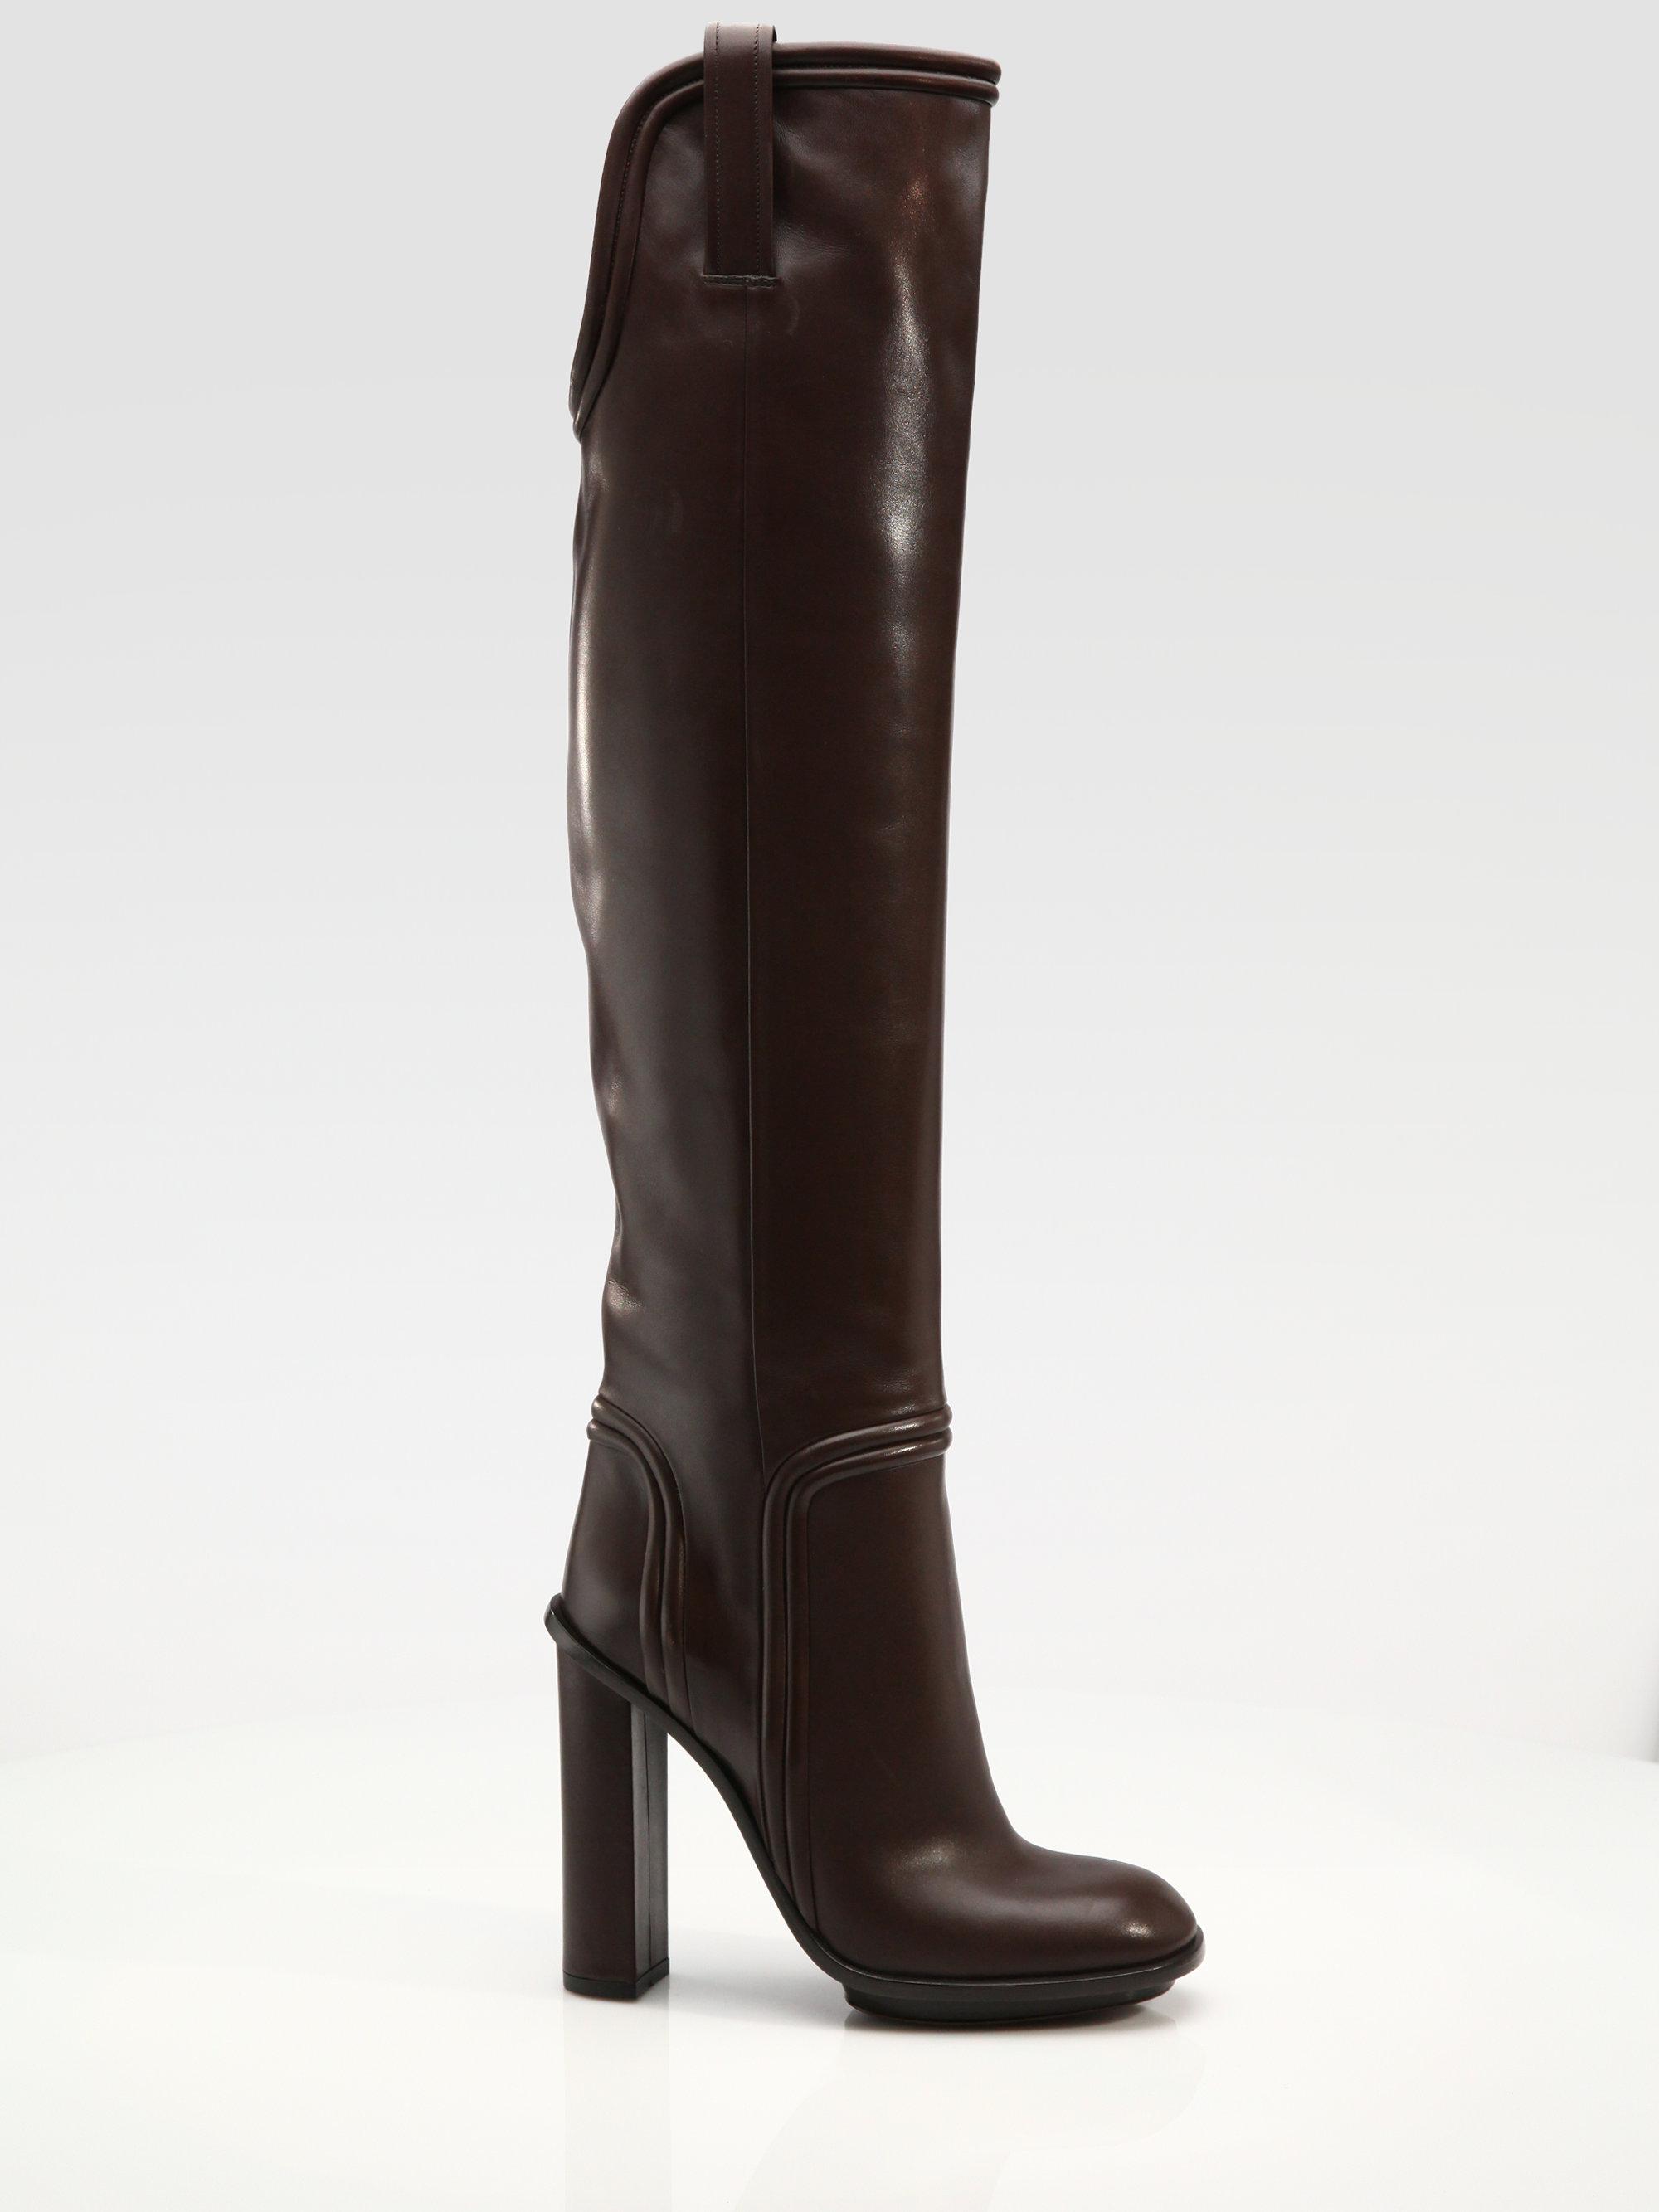 db85a2c0dc7 Lyst - Gucci Trish Highheel Platform Boots in Black